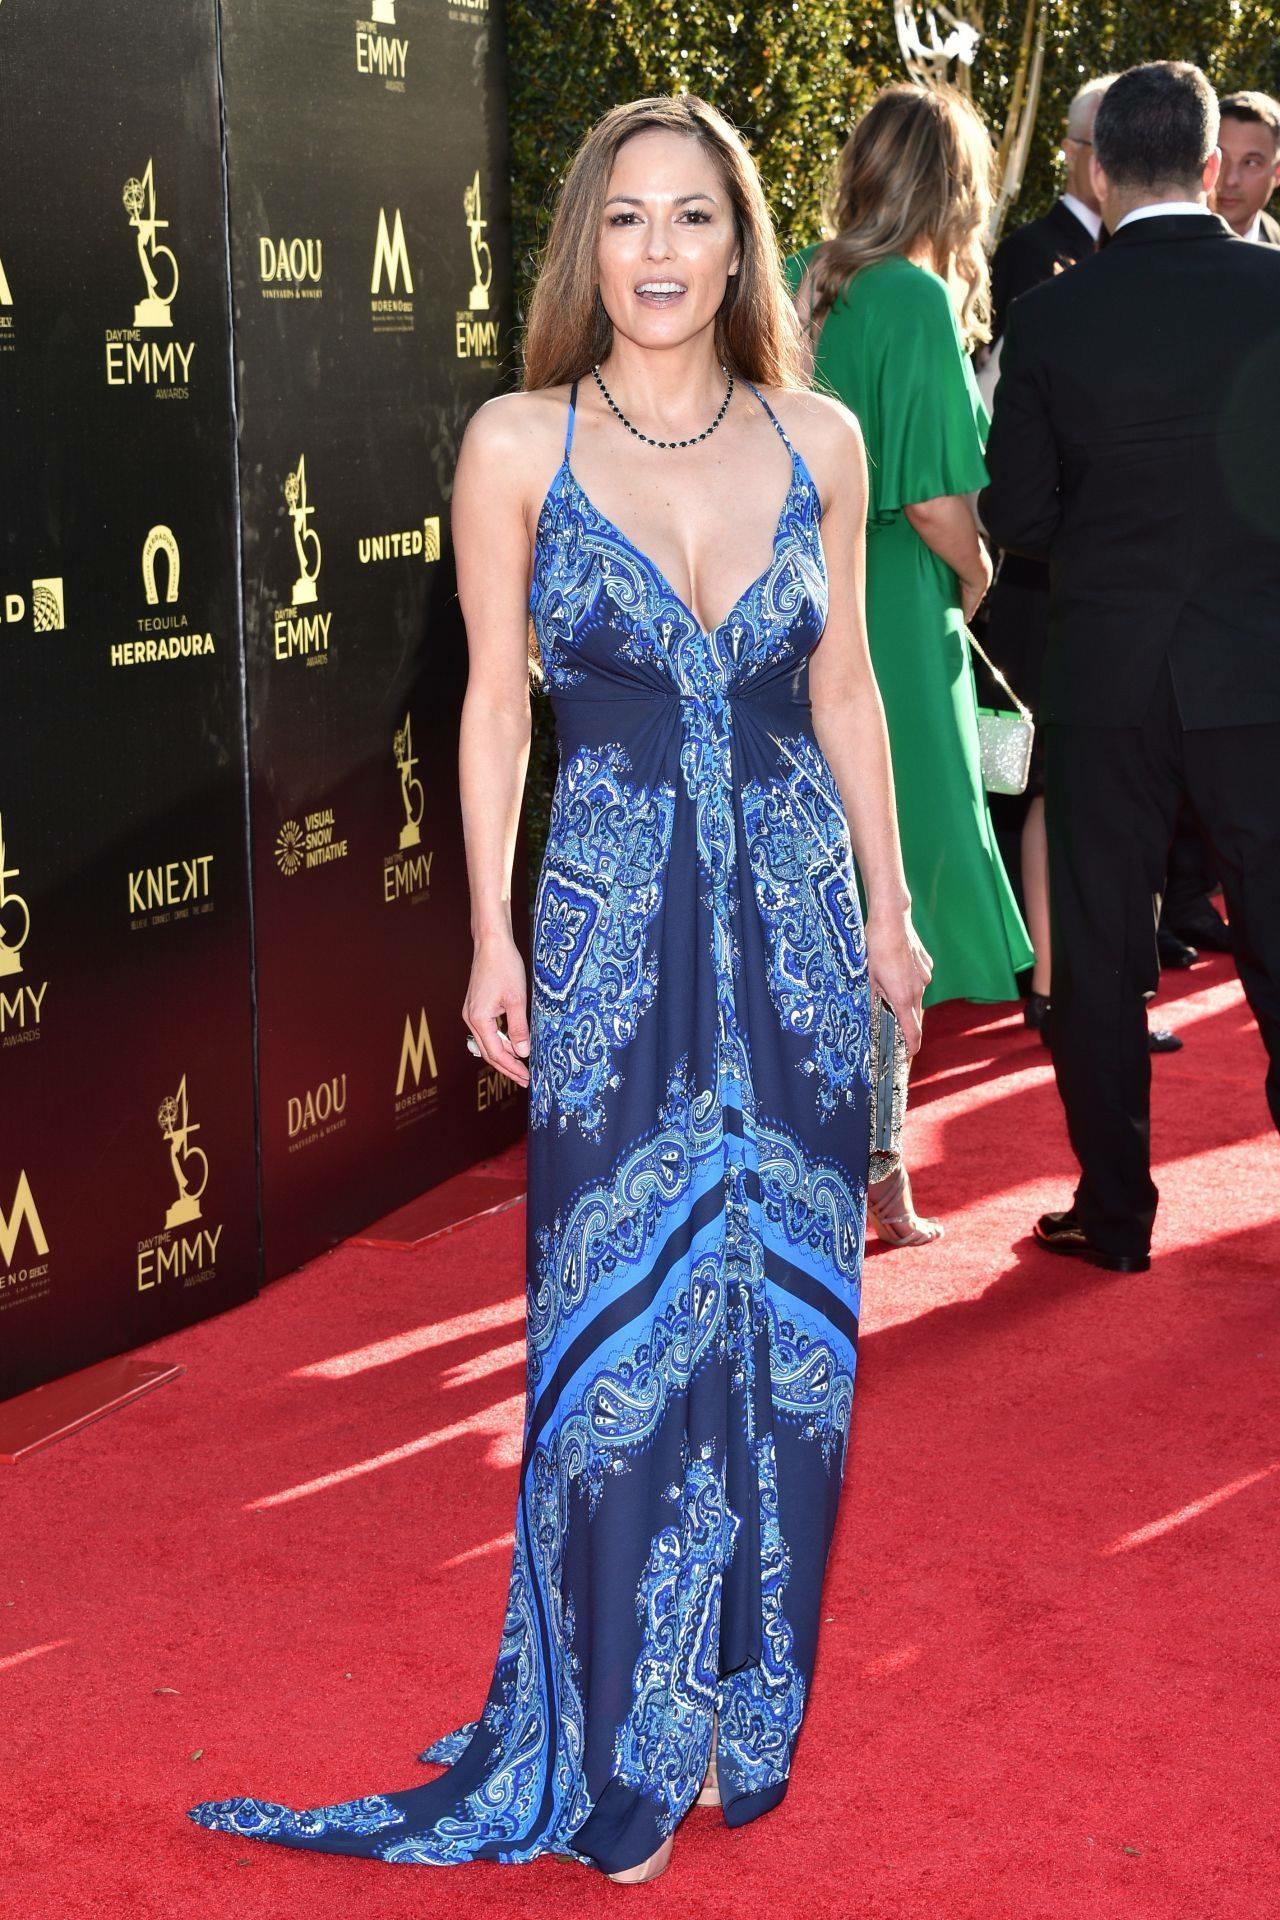 Terri Ivens at the 2018 Daytime Emmy Awards, dress by Heidi Abra